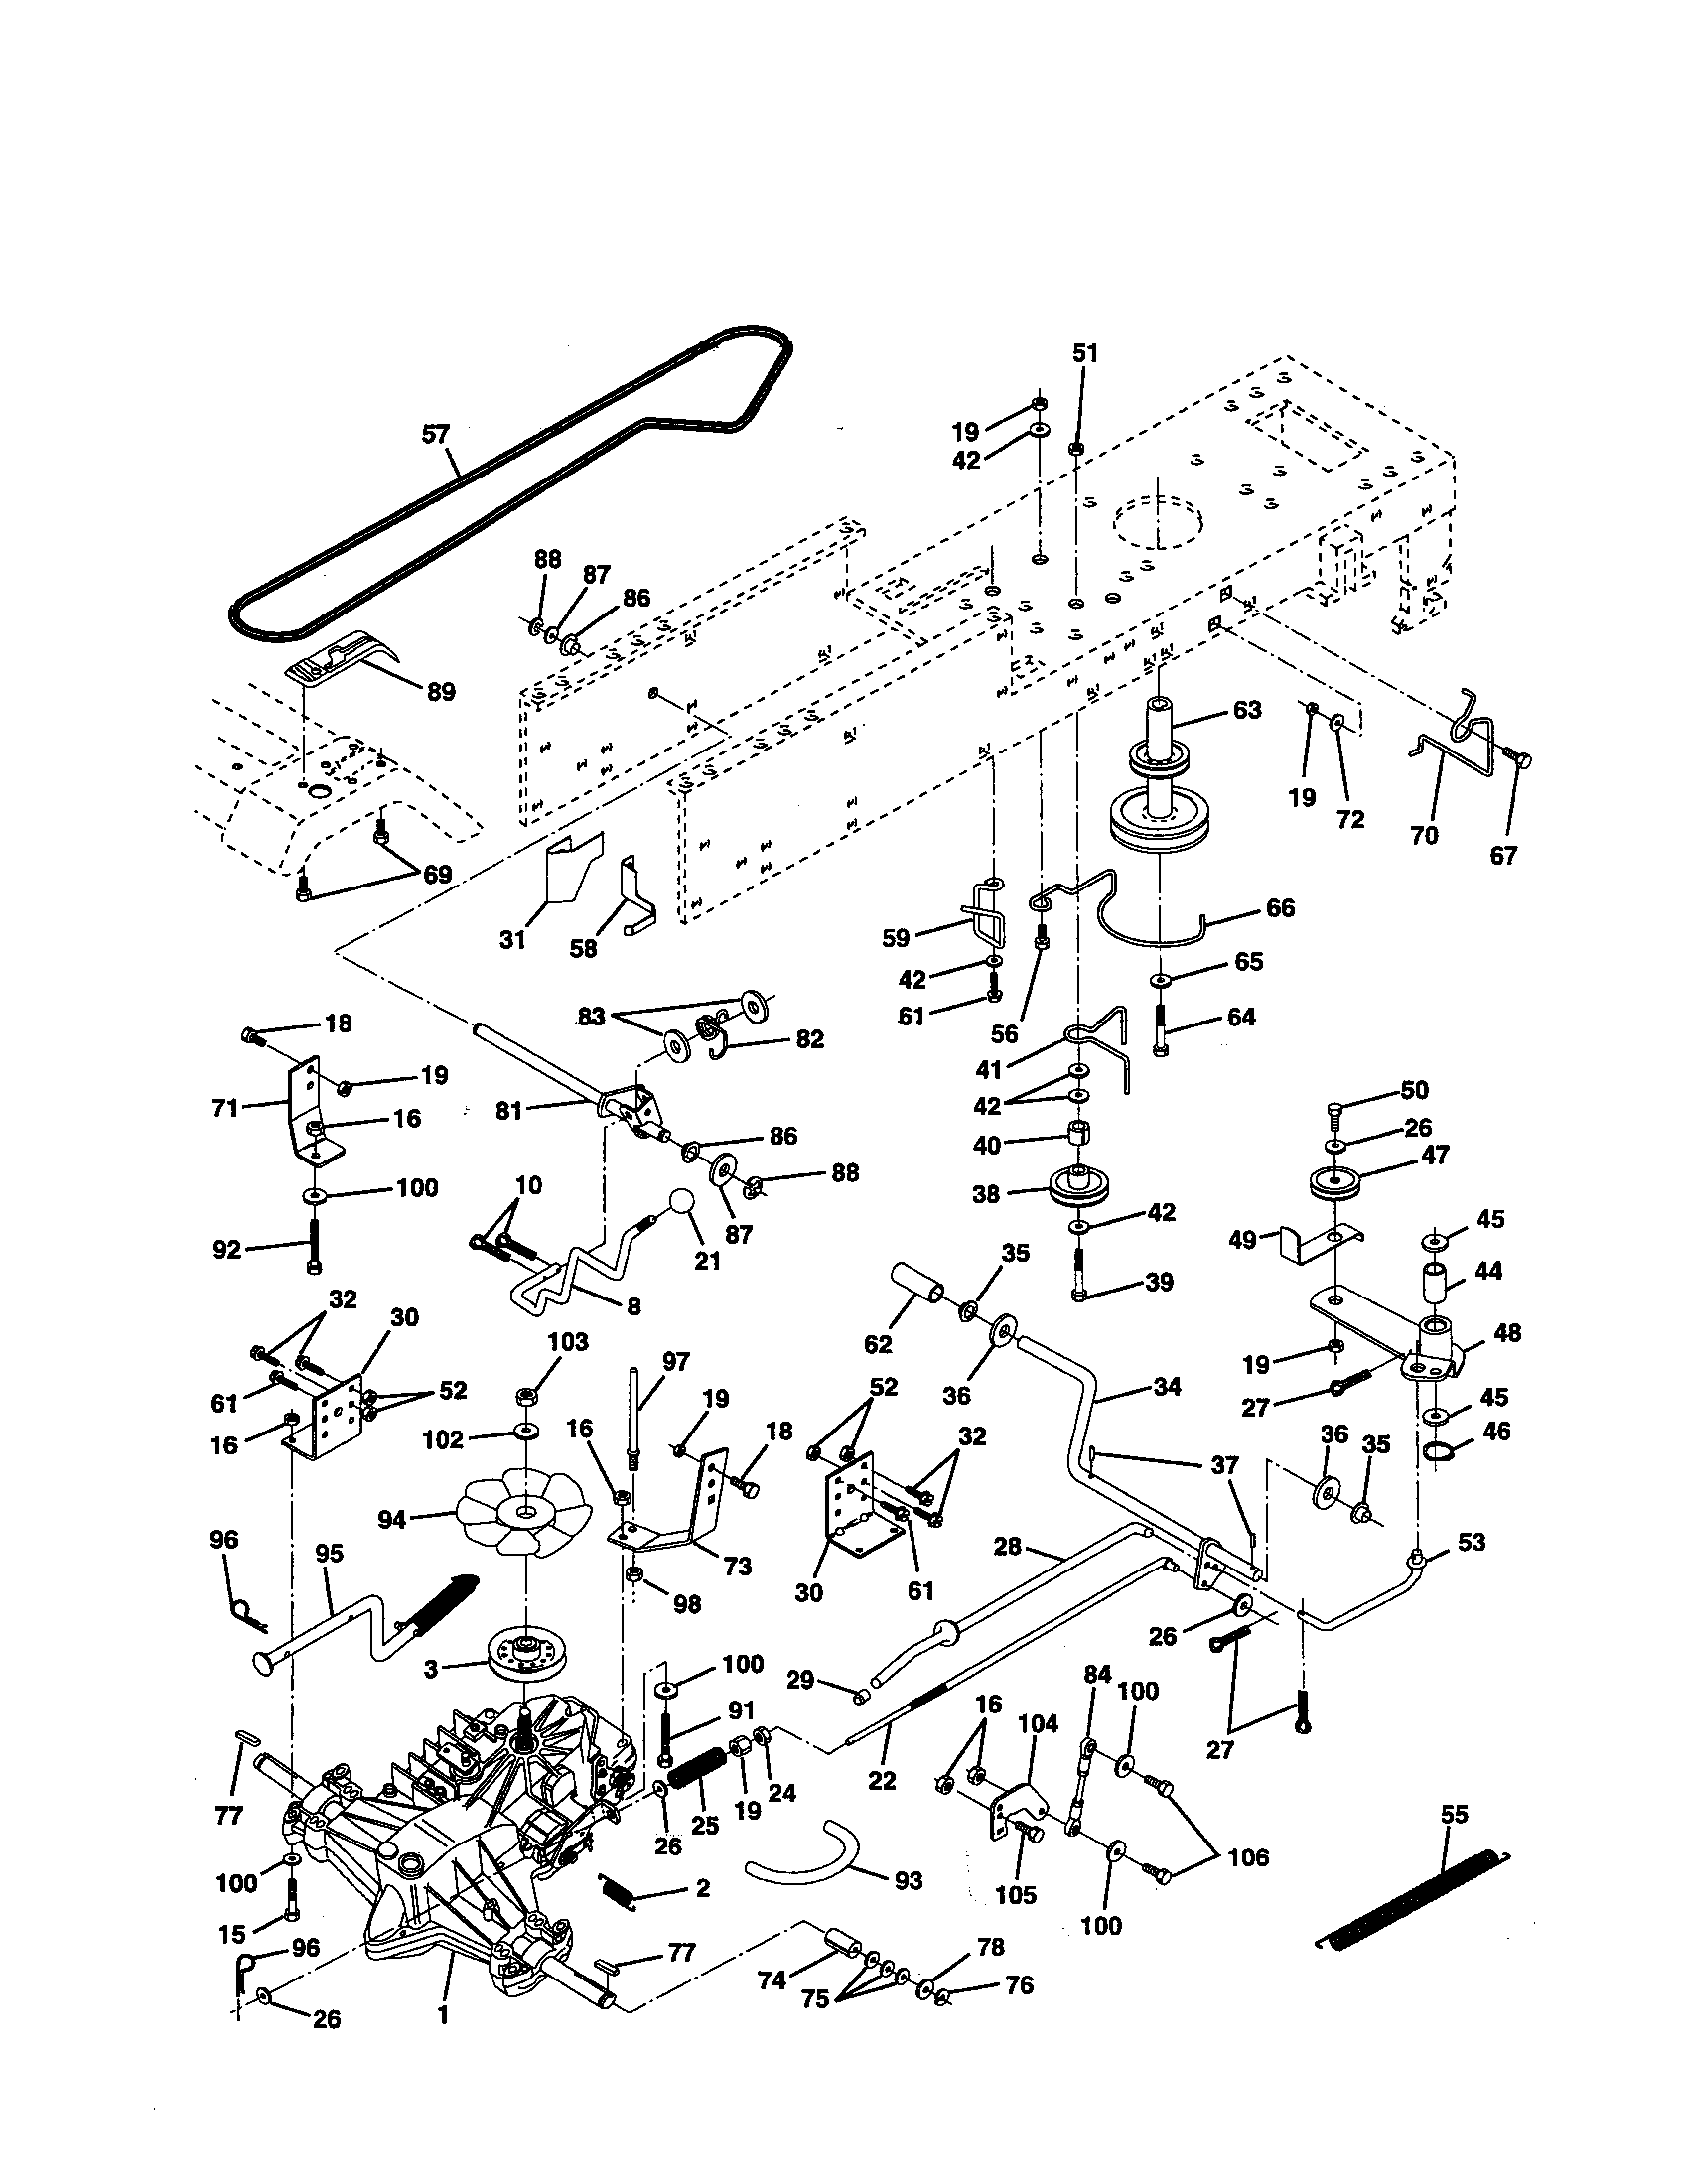 DRIVE Diagram & Parts List for Model 917252531 Craftsman